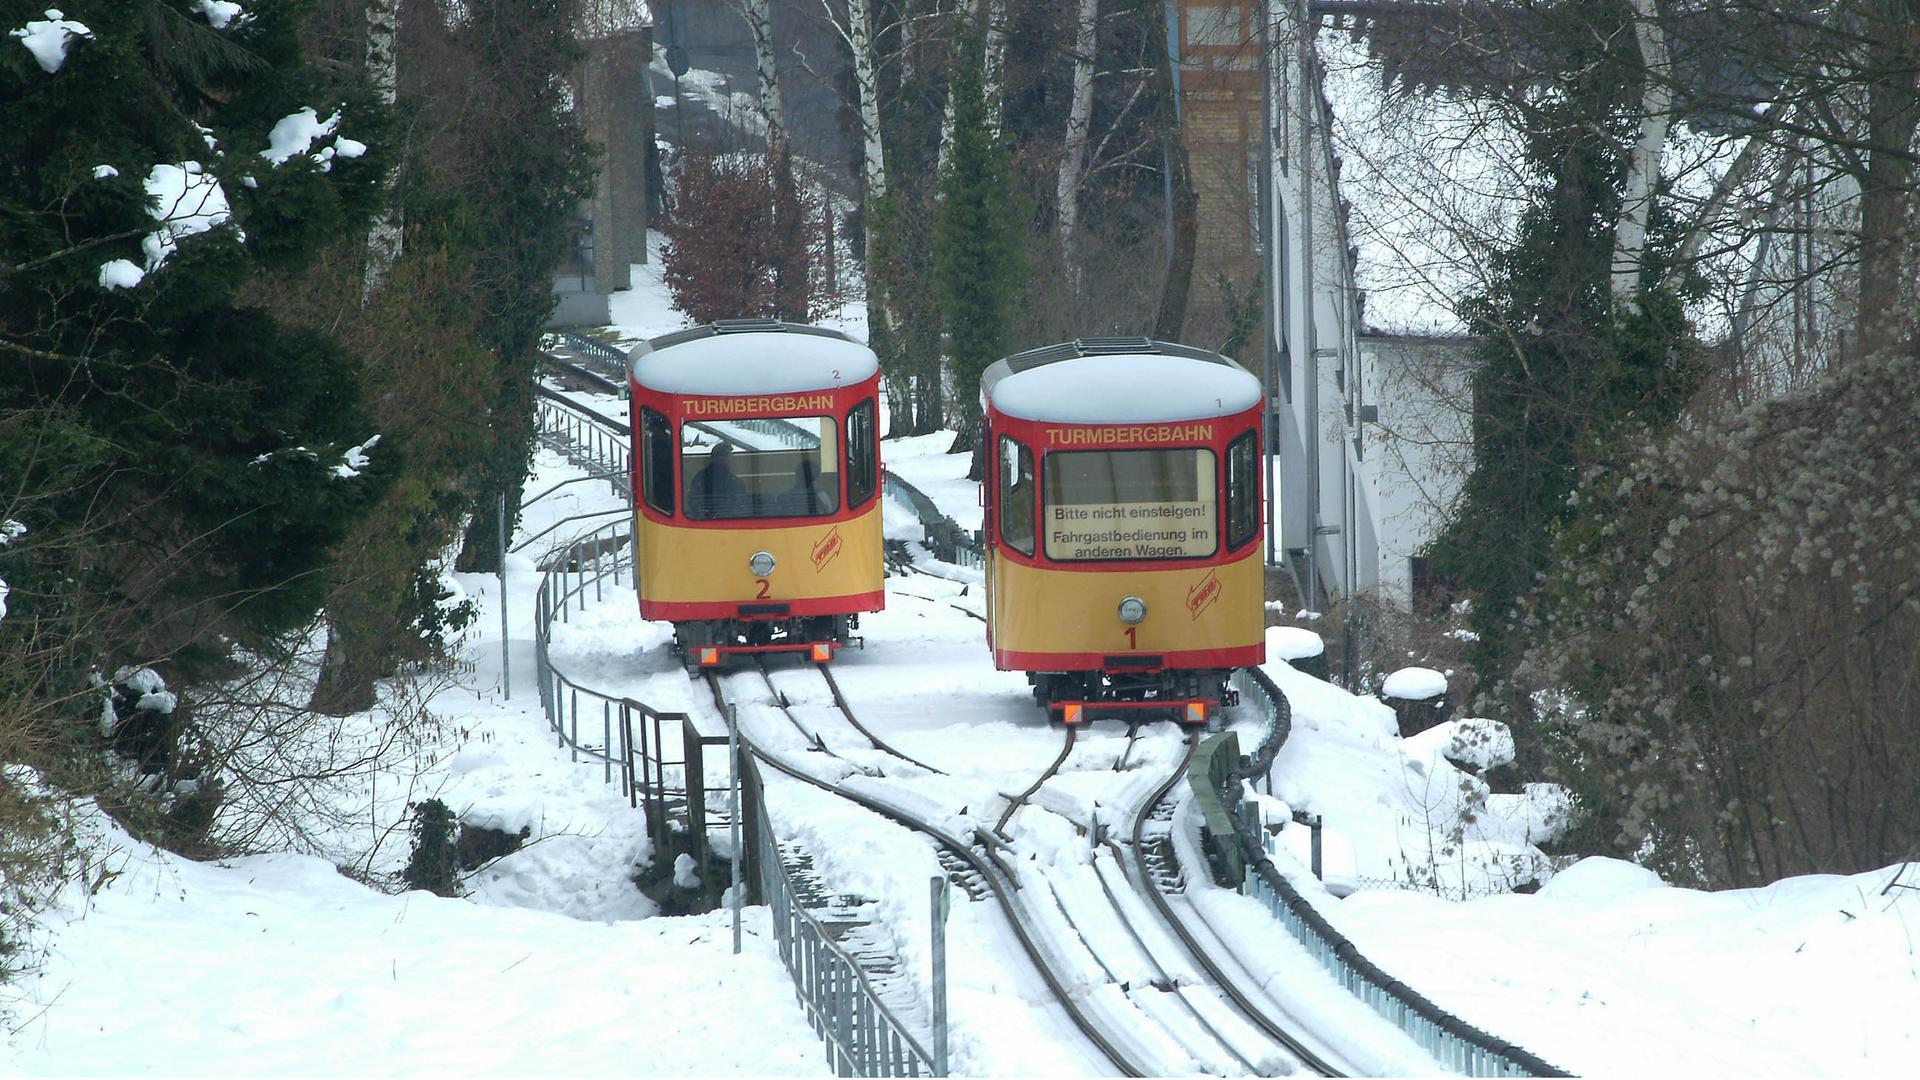 Archivfoto vom 6.3.2005: Turmbergbahn im Winter